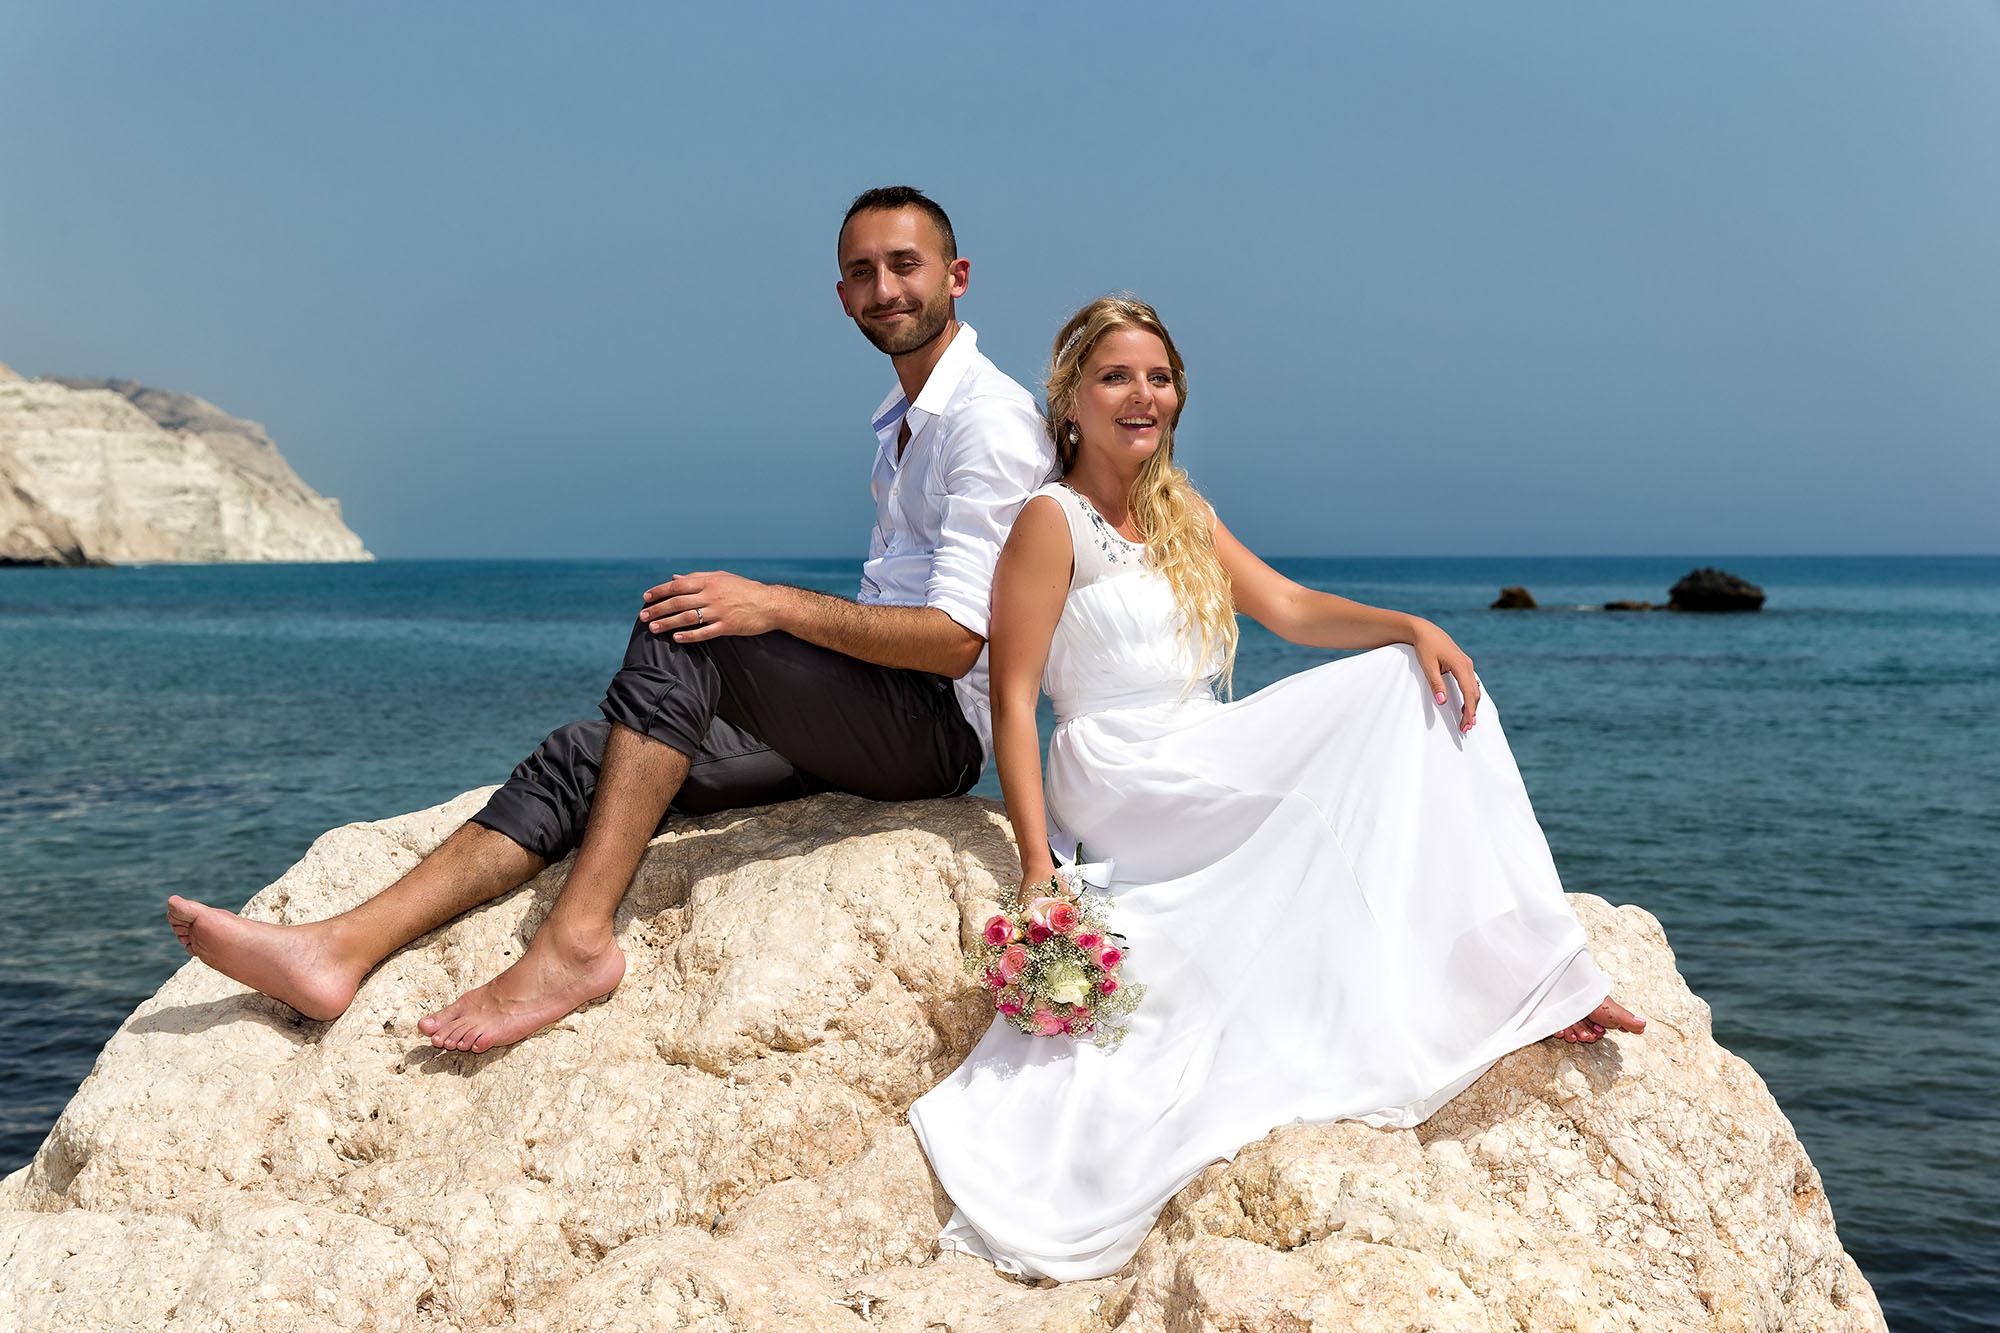 Romantic wedding photos taken at Aphrodite's Rock